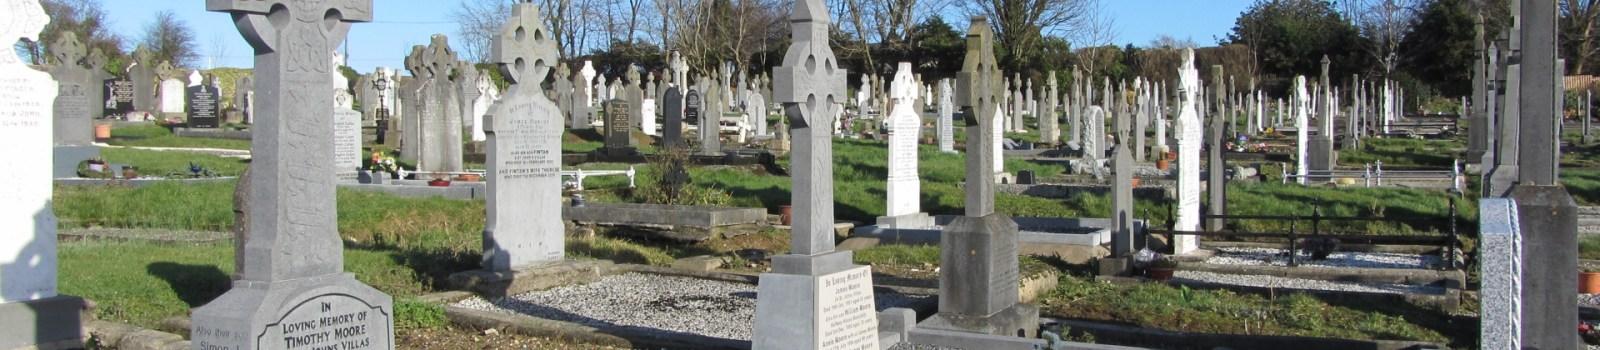 St. Mary's Cemetery Enniscorthy